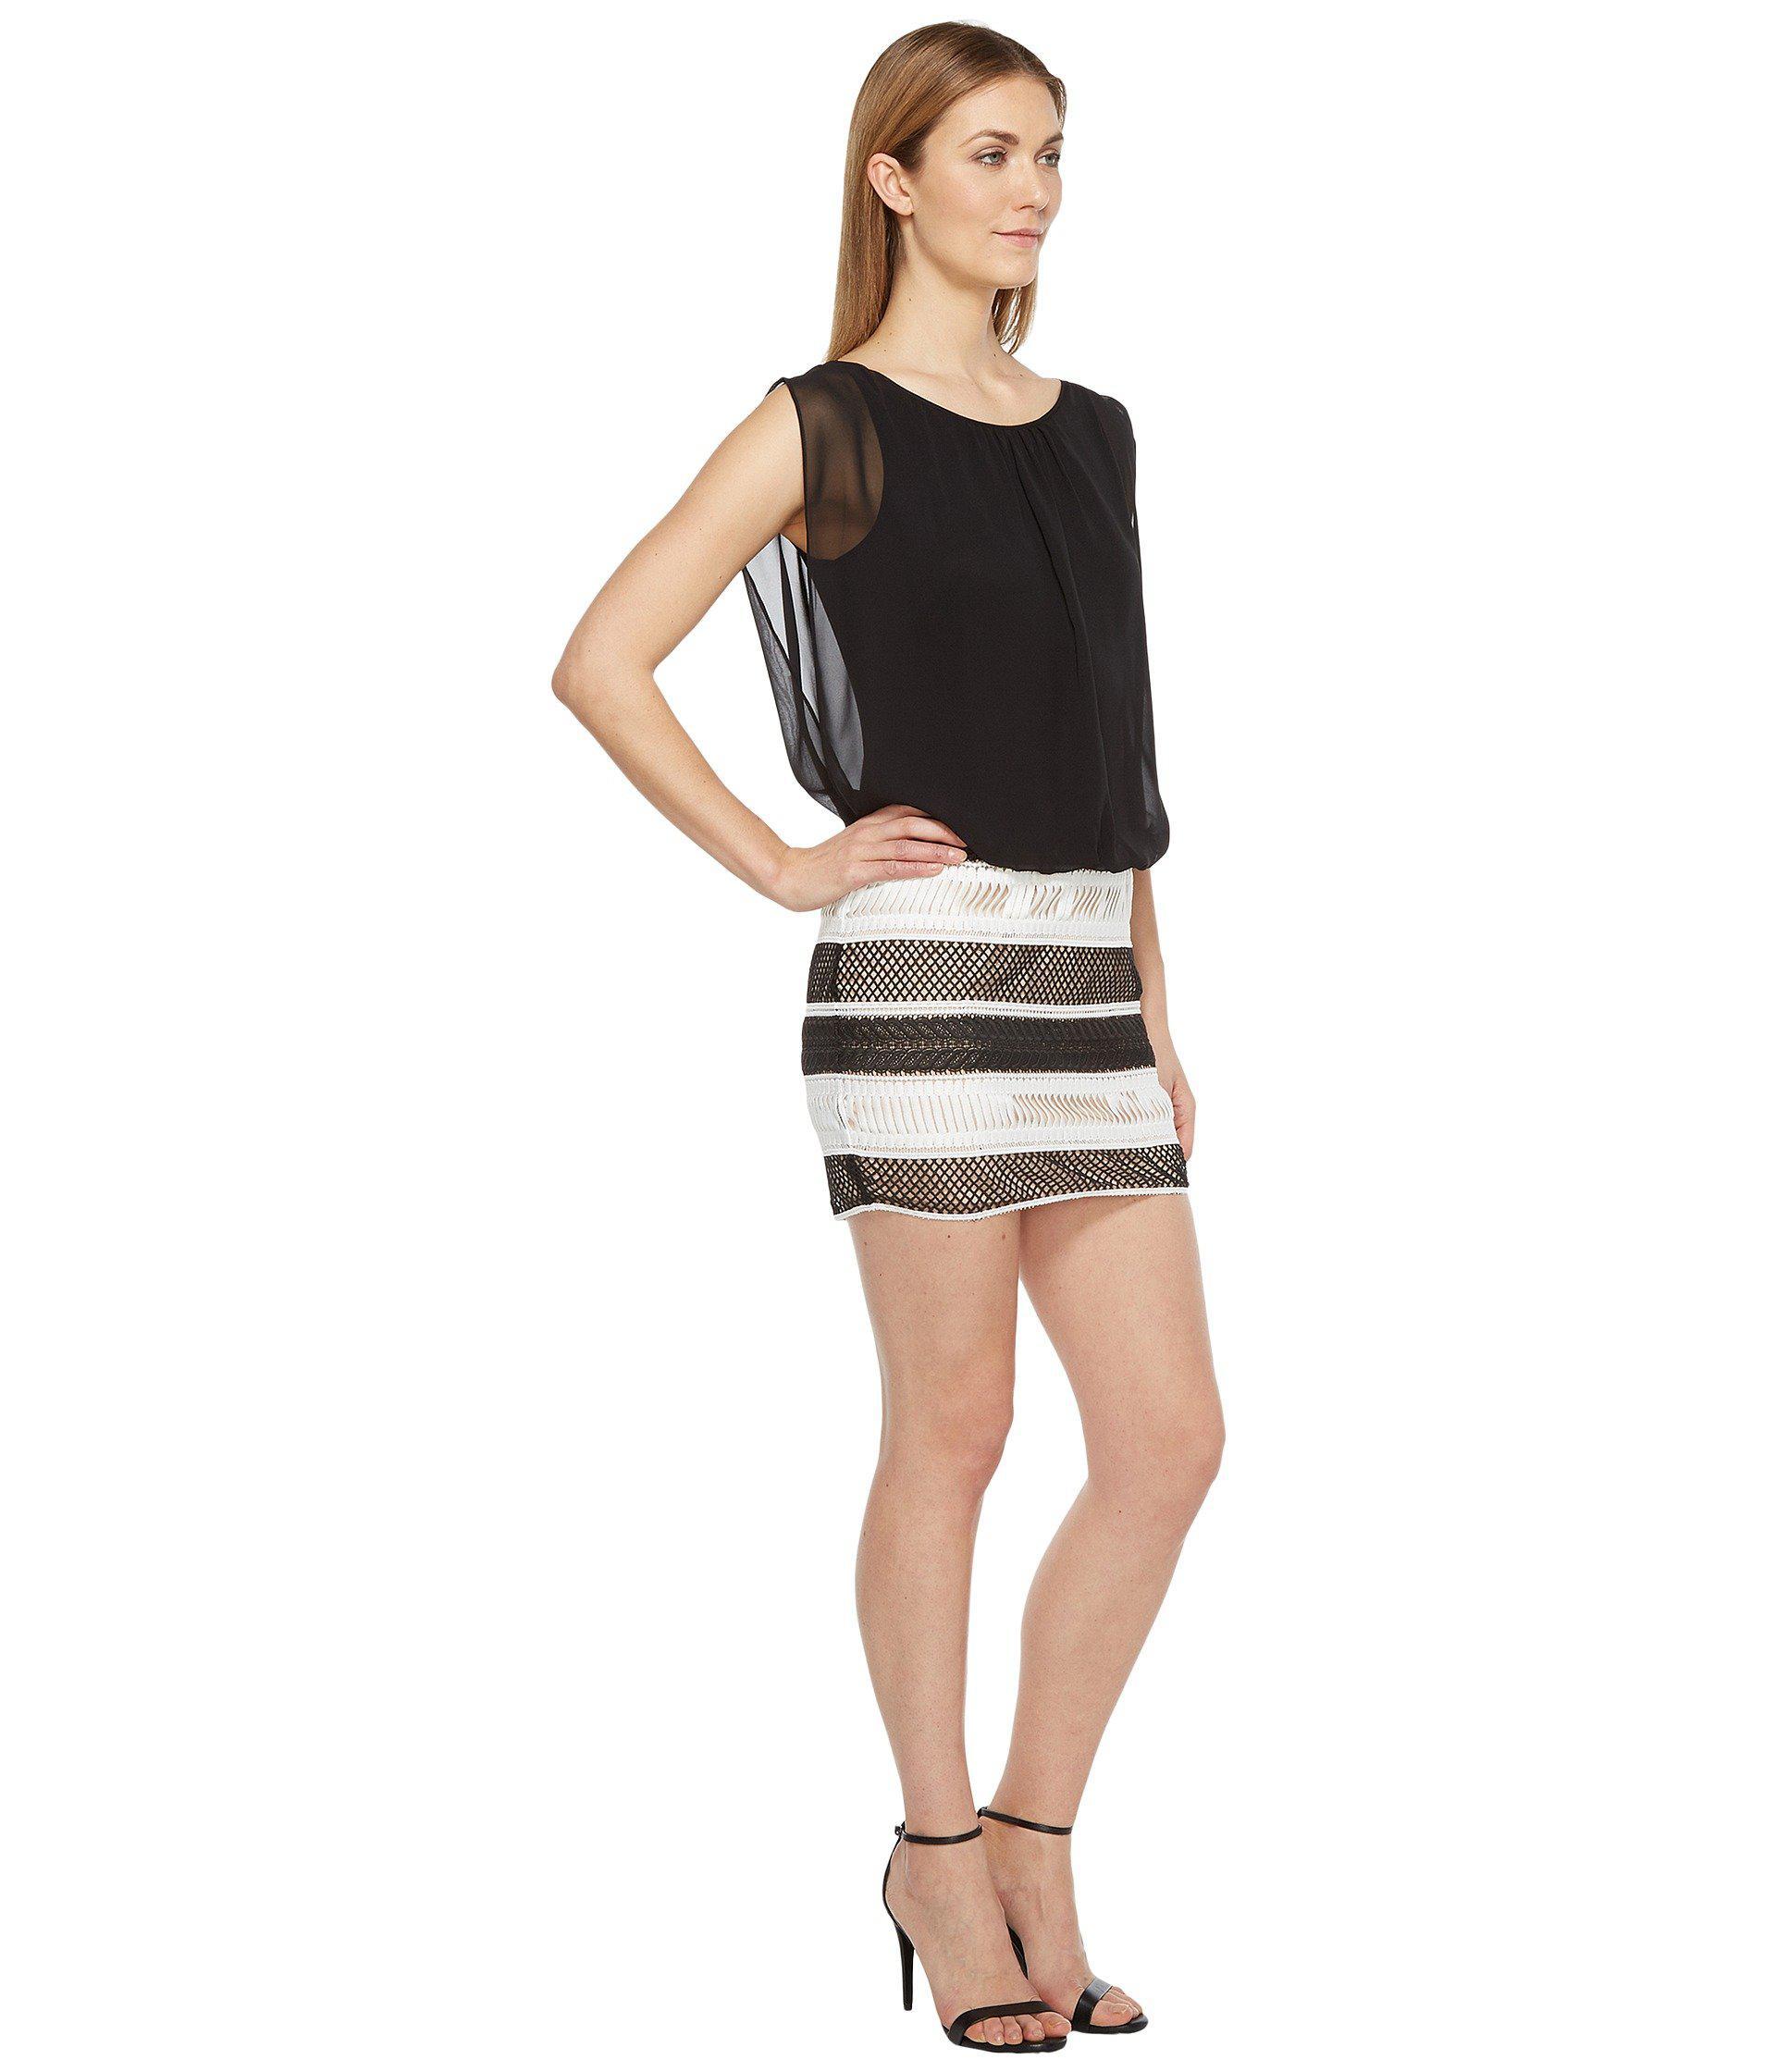 febd38446ac Lyst - Aidan Mattox Lace And Chiffon Blouson Dress in Black